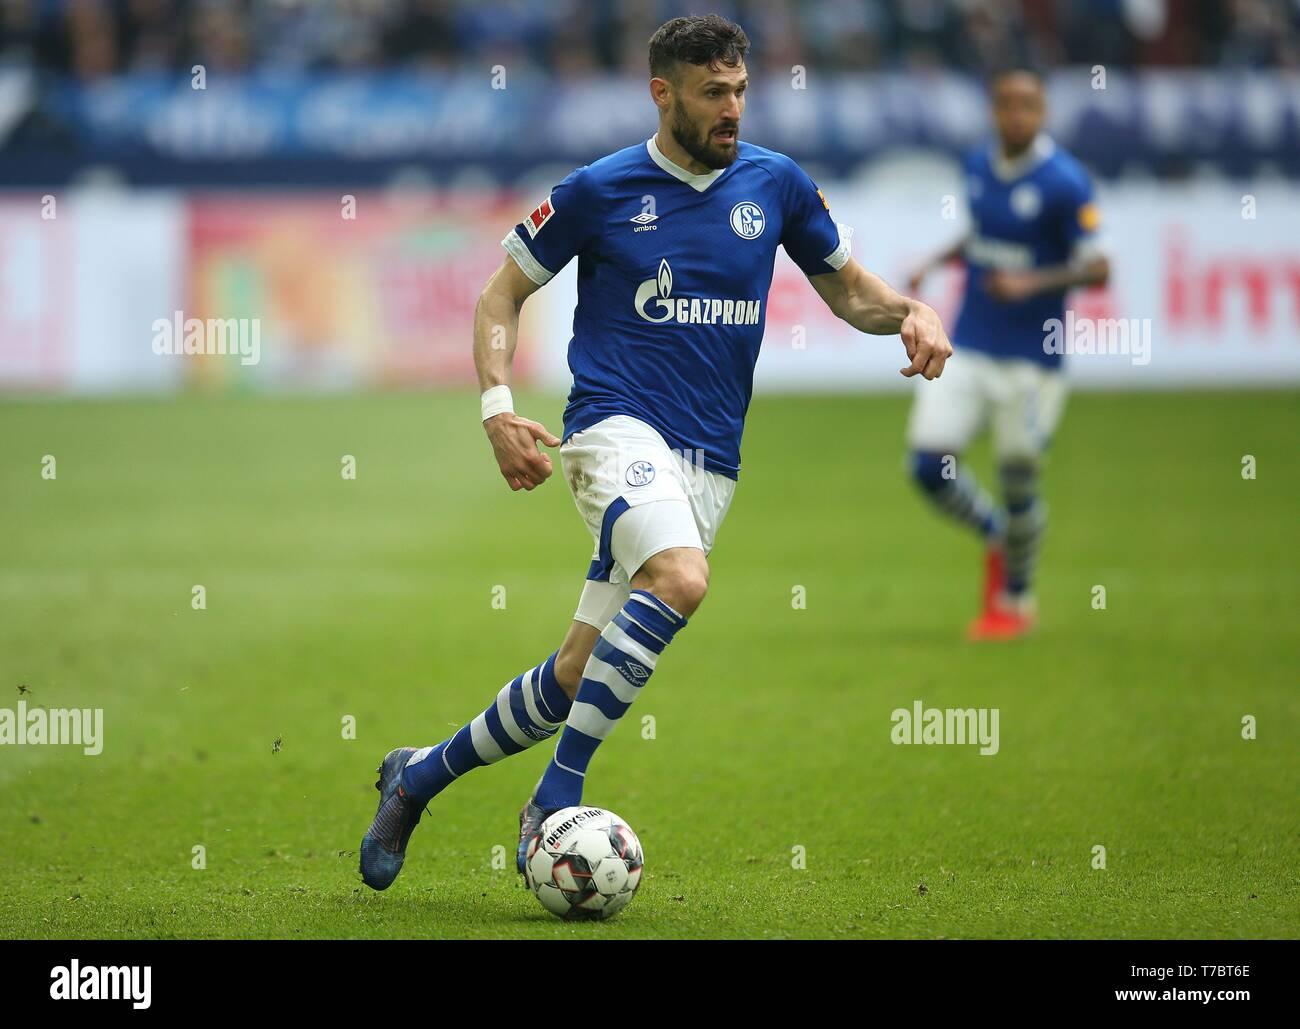 firo: 05.05.2019, Football, 2018/2019, 1.Bundesliga: FC Schalke 04 - FC Augsburg Daniel Caligiuri, single action   usage worldwide - Stock Image